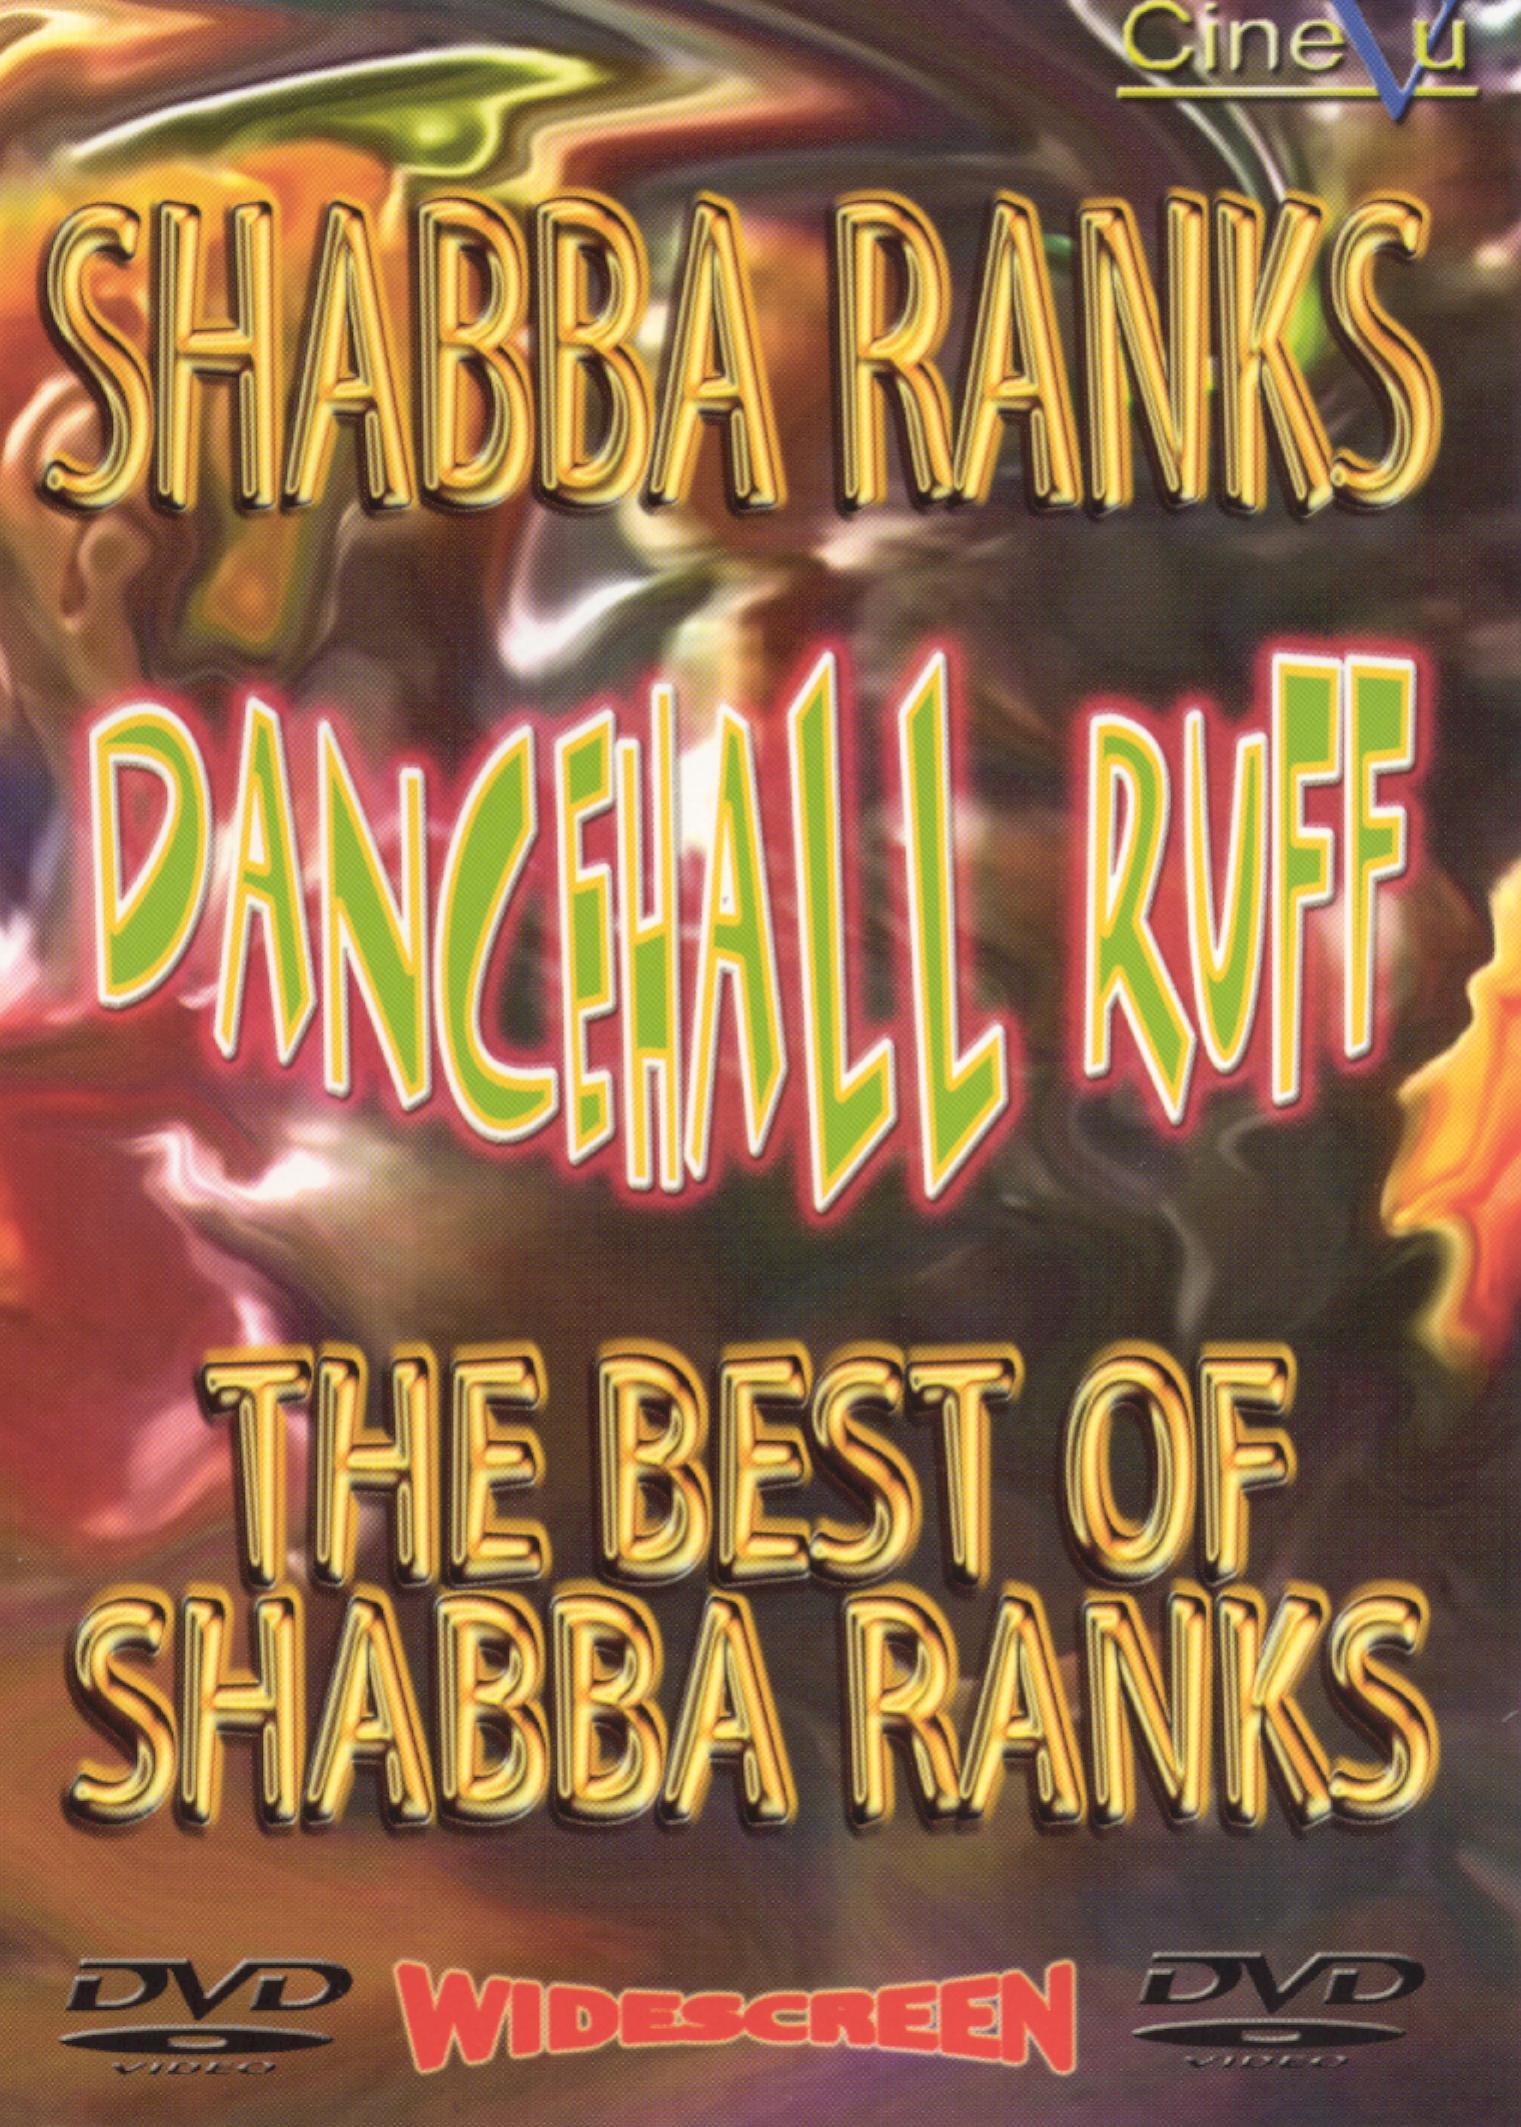 Shabba Ranks: Dancehall Ruff - Best of Shabba Ranks